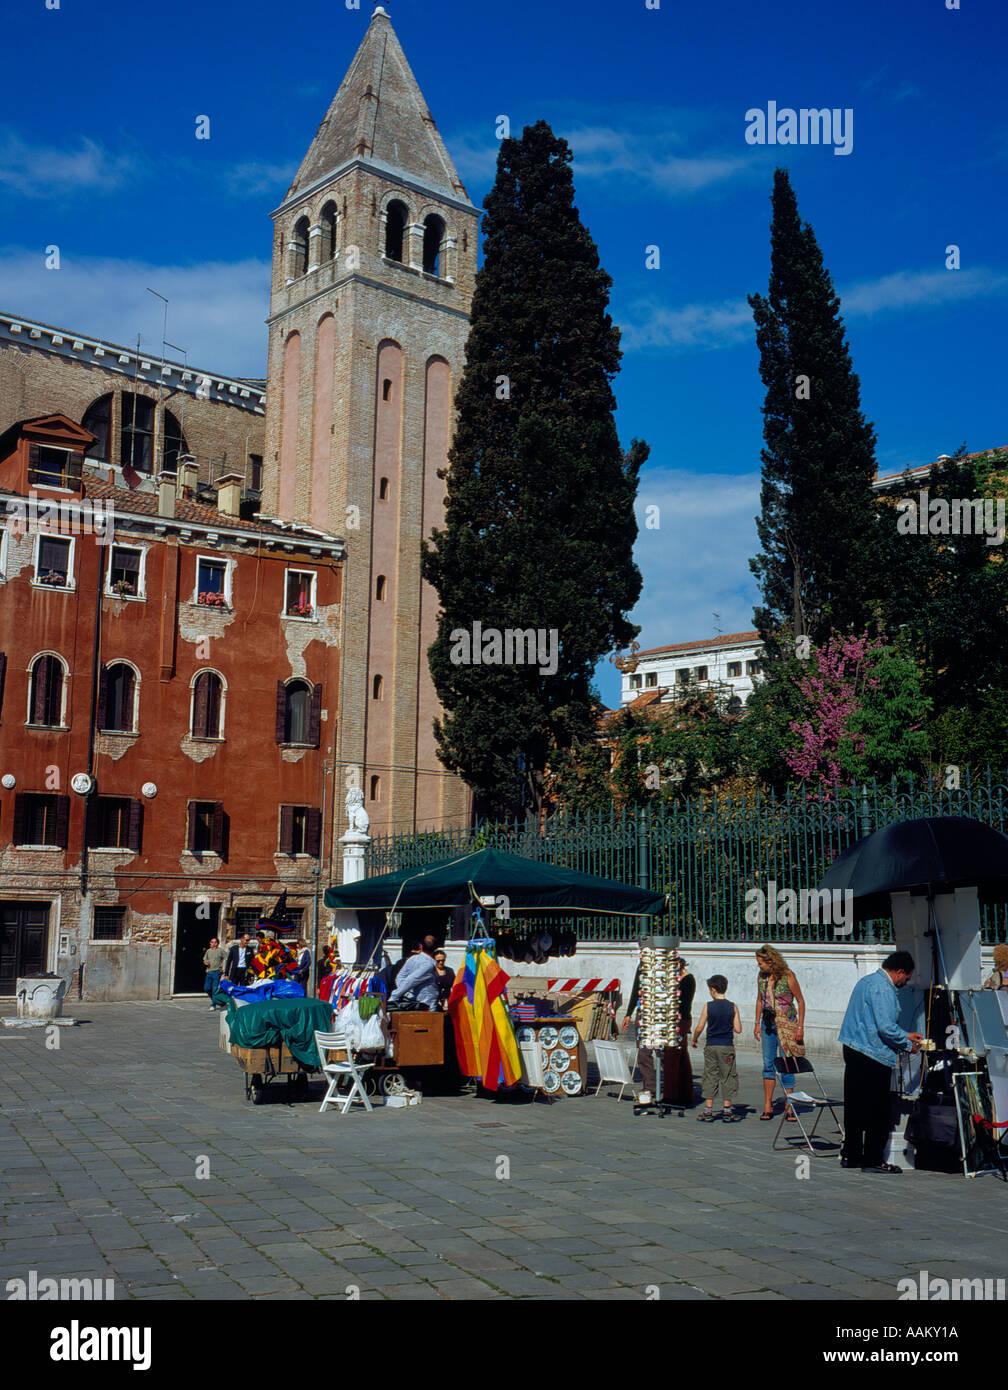 Campo Vidal, Venice, UNESCO World Heritage Site, Italy, Europe. Photo by Willy Matheisl - Stock Image